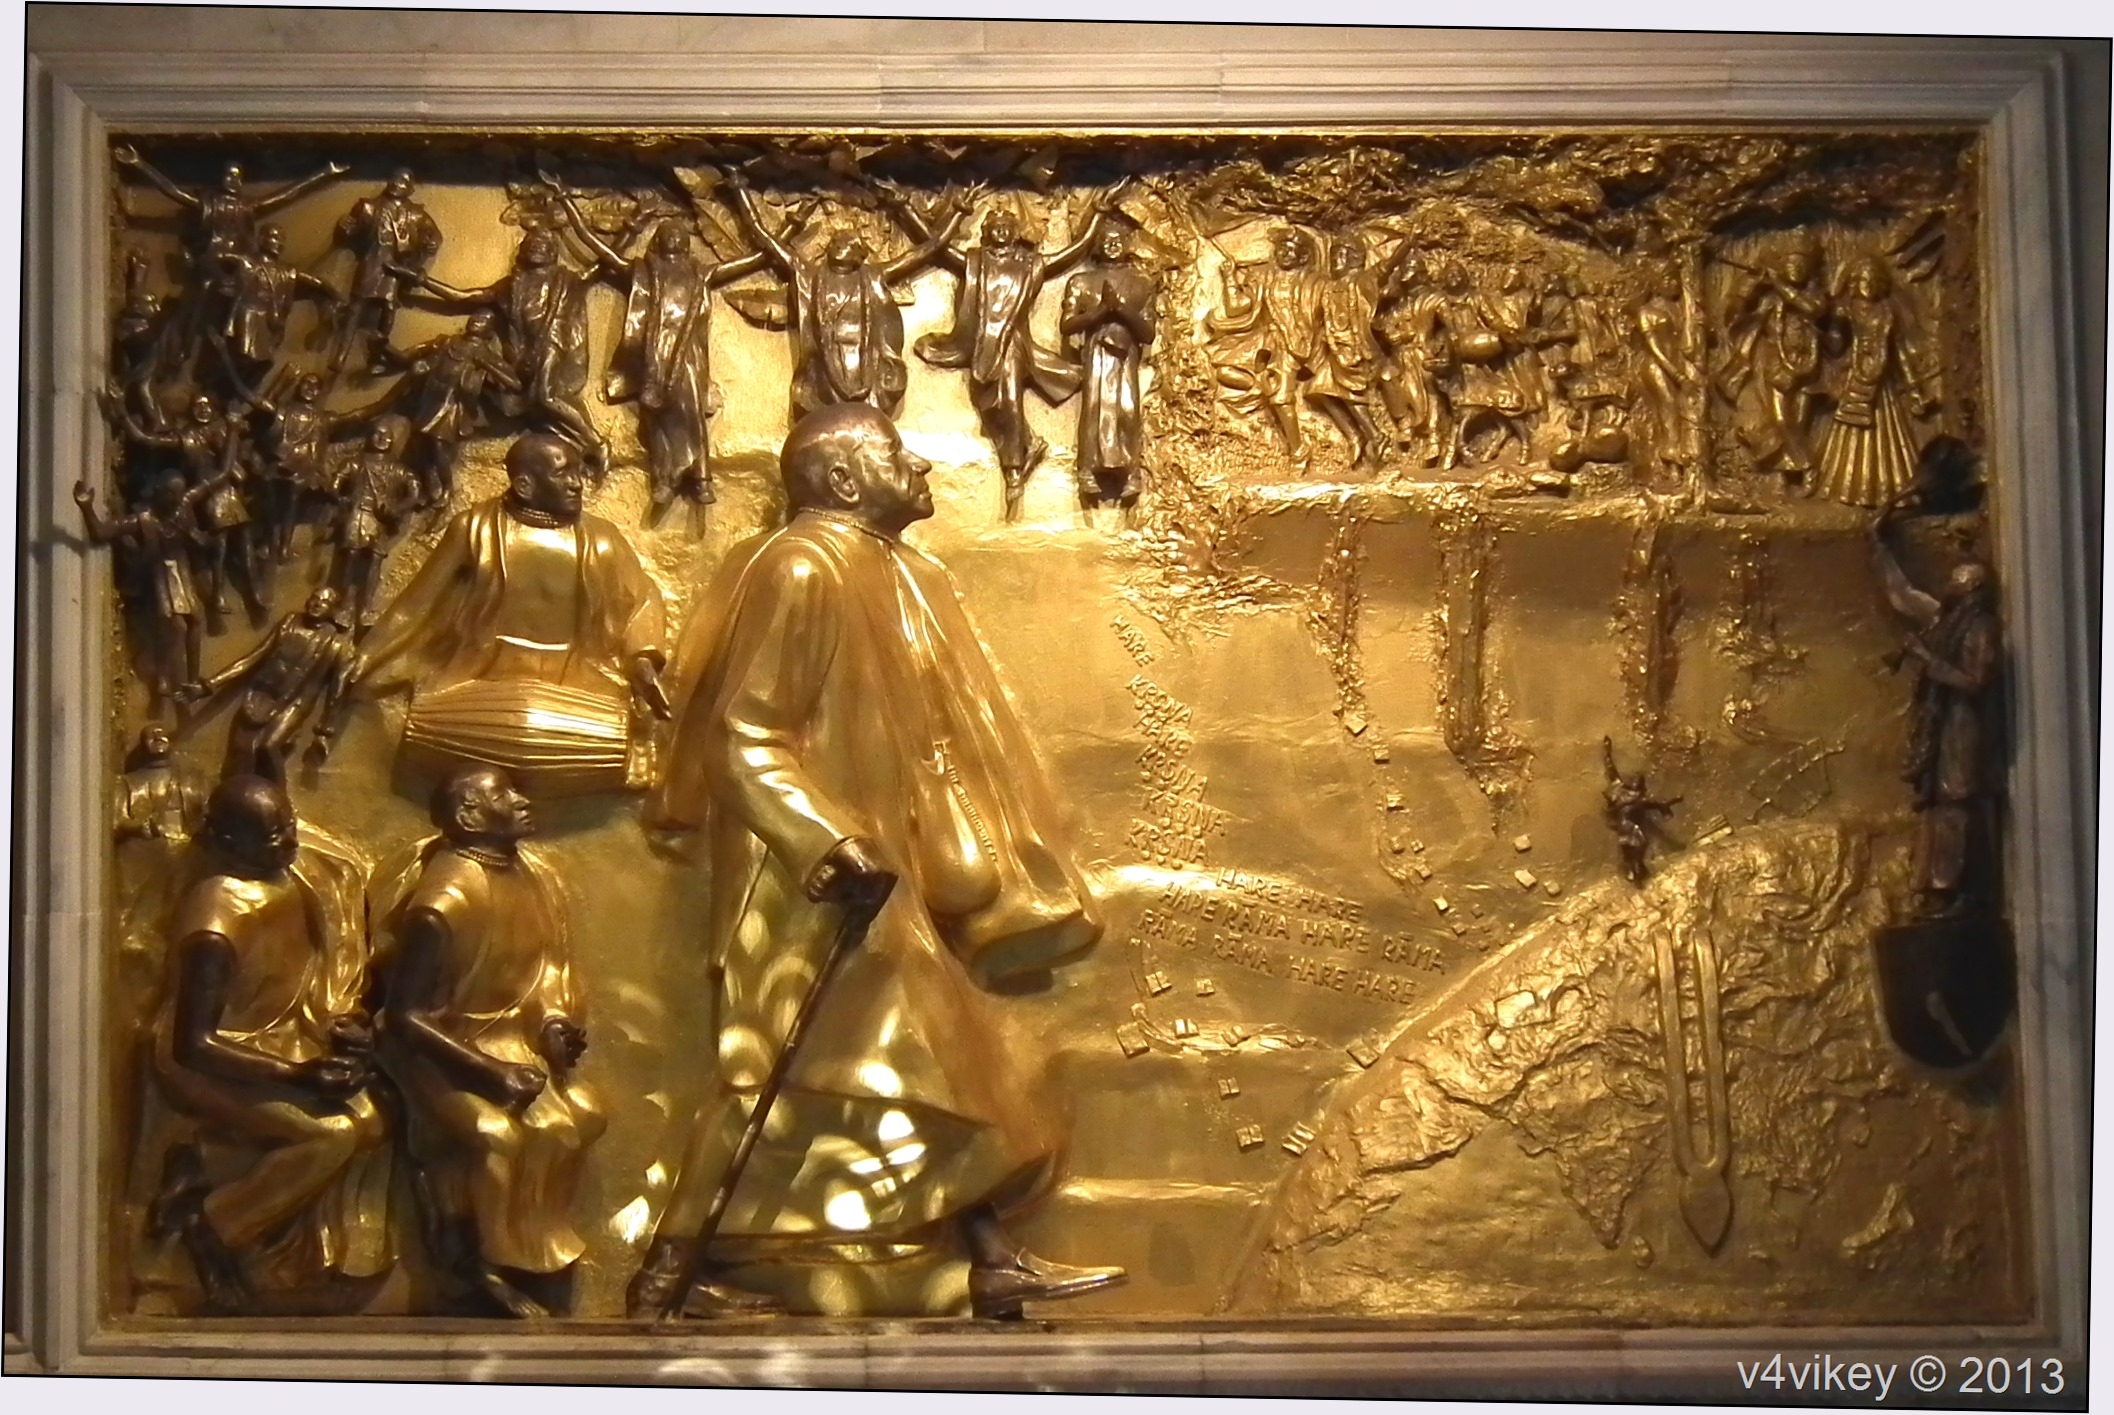 3D Painting of Swami Prabhupada